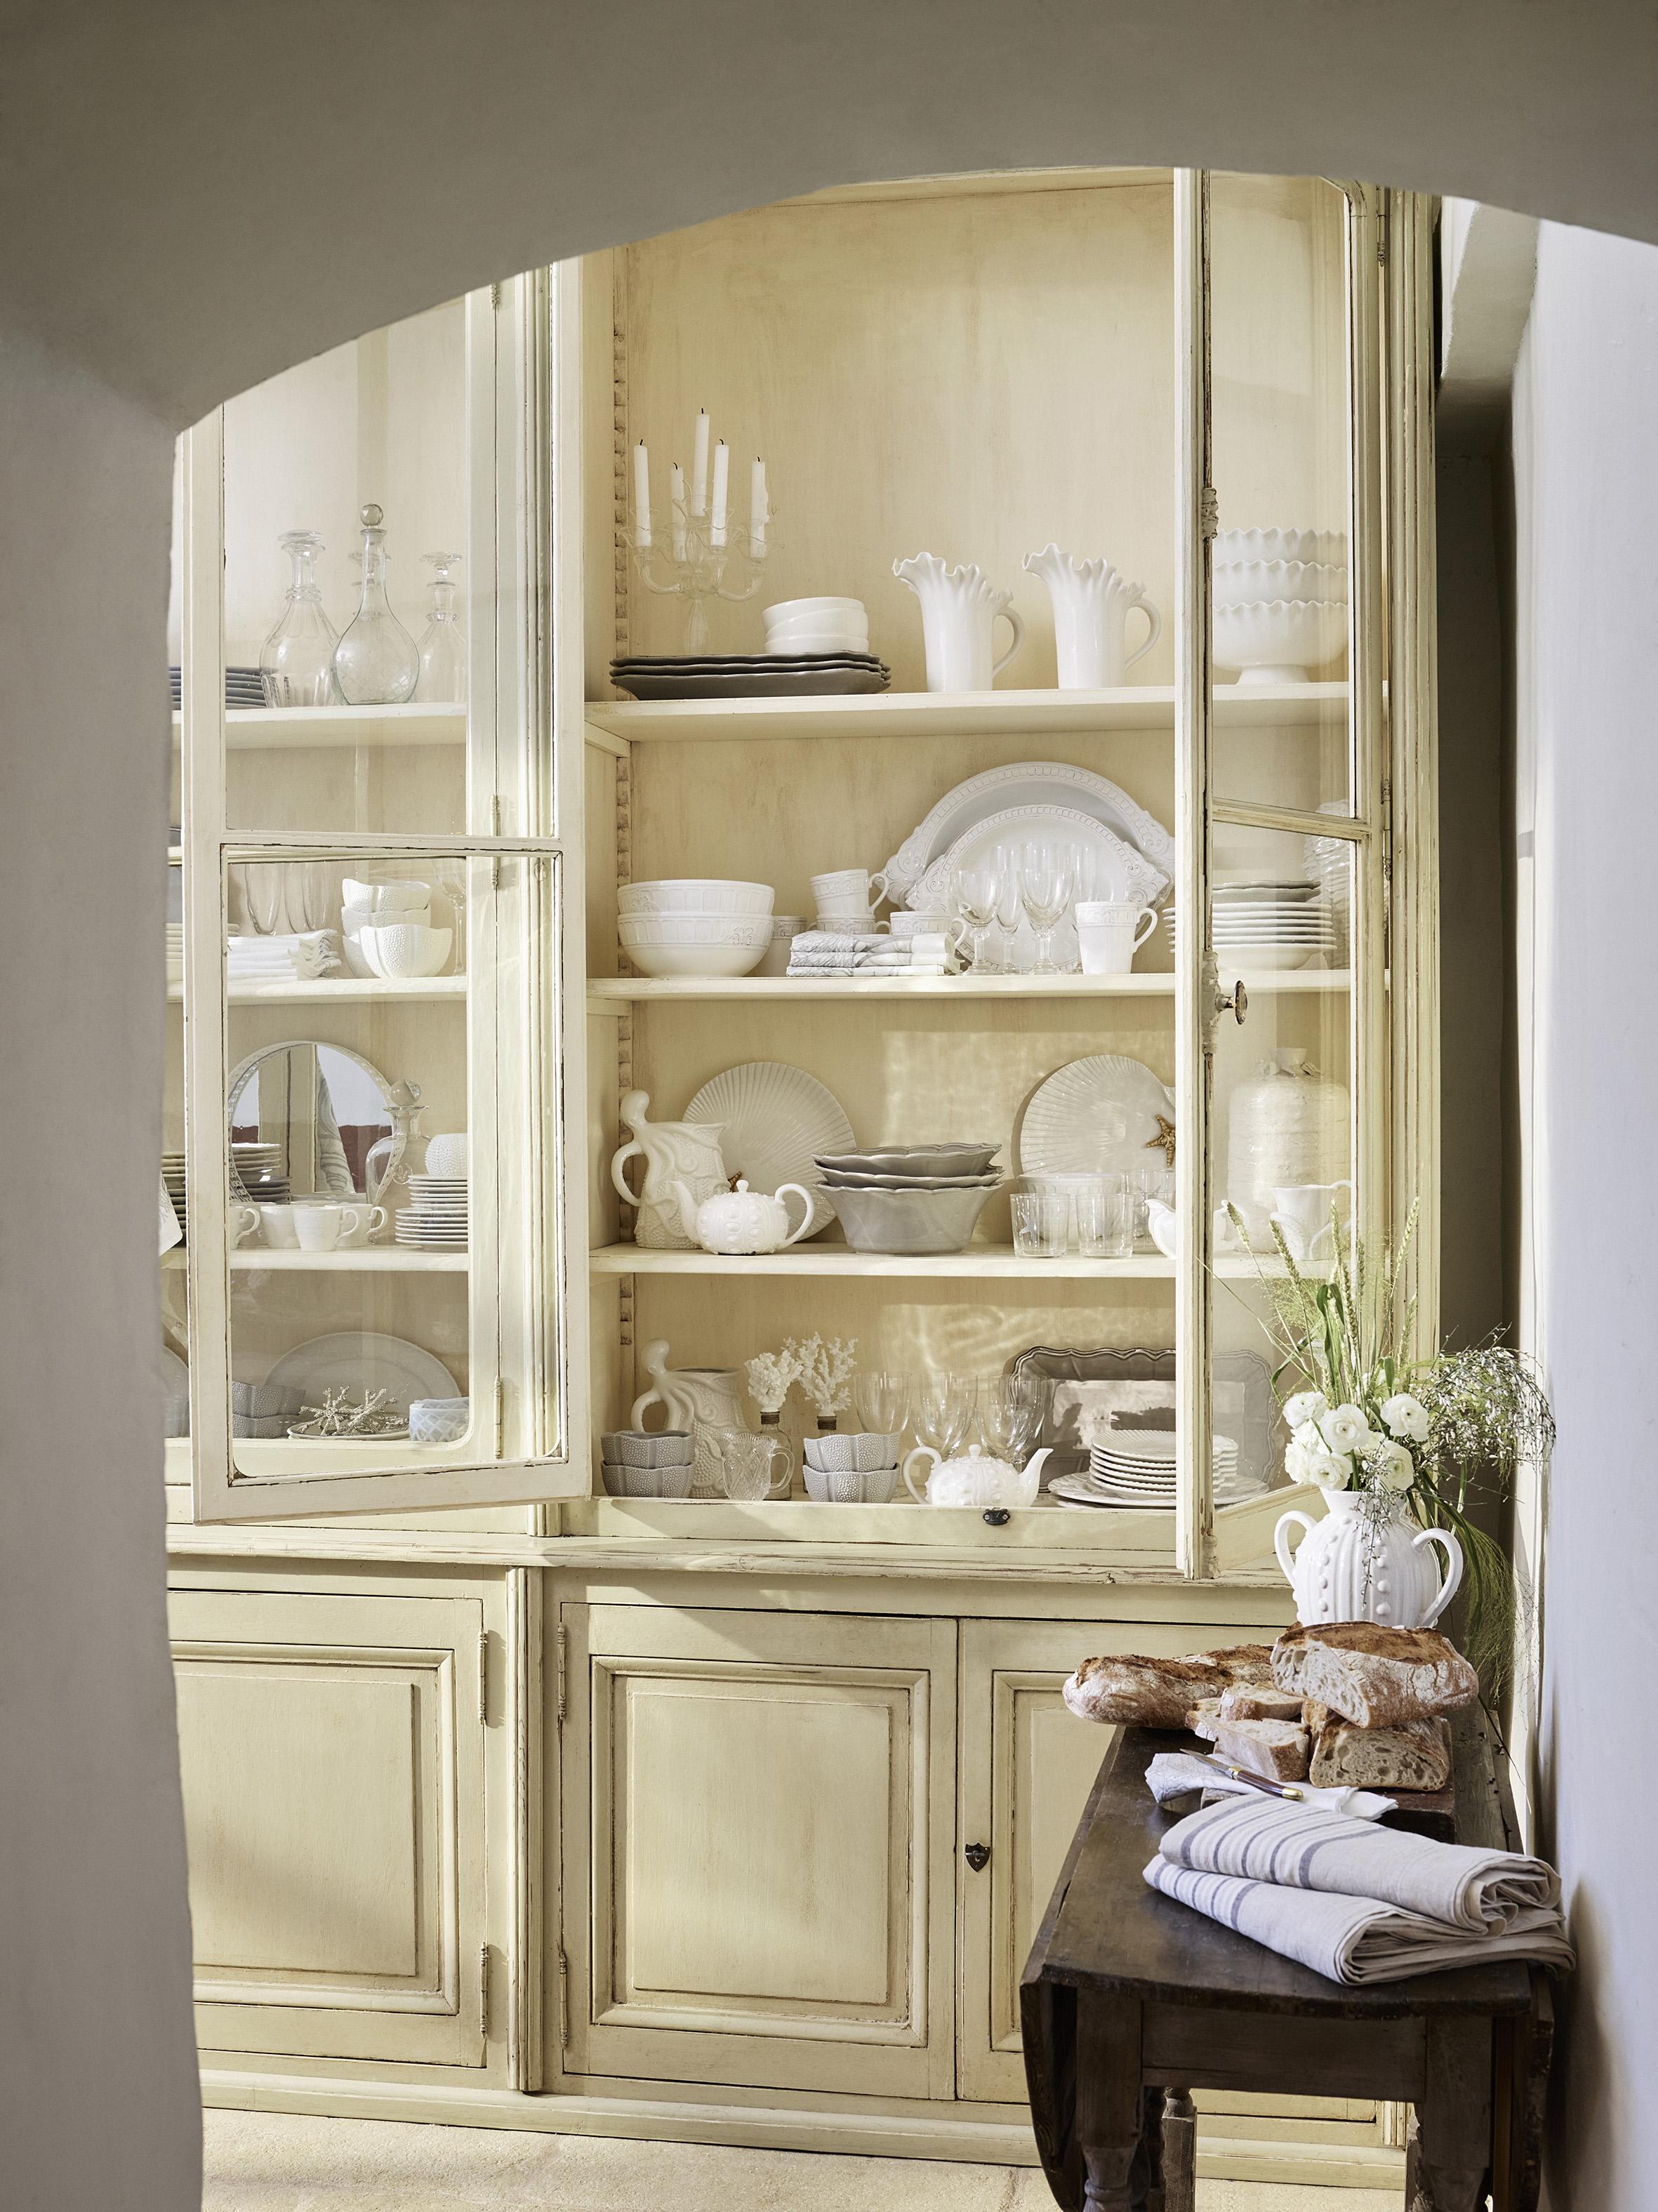 Zara home ss 2016 versailles e cabinet de curiosit s - Zara home muebles ...